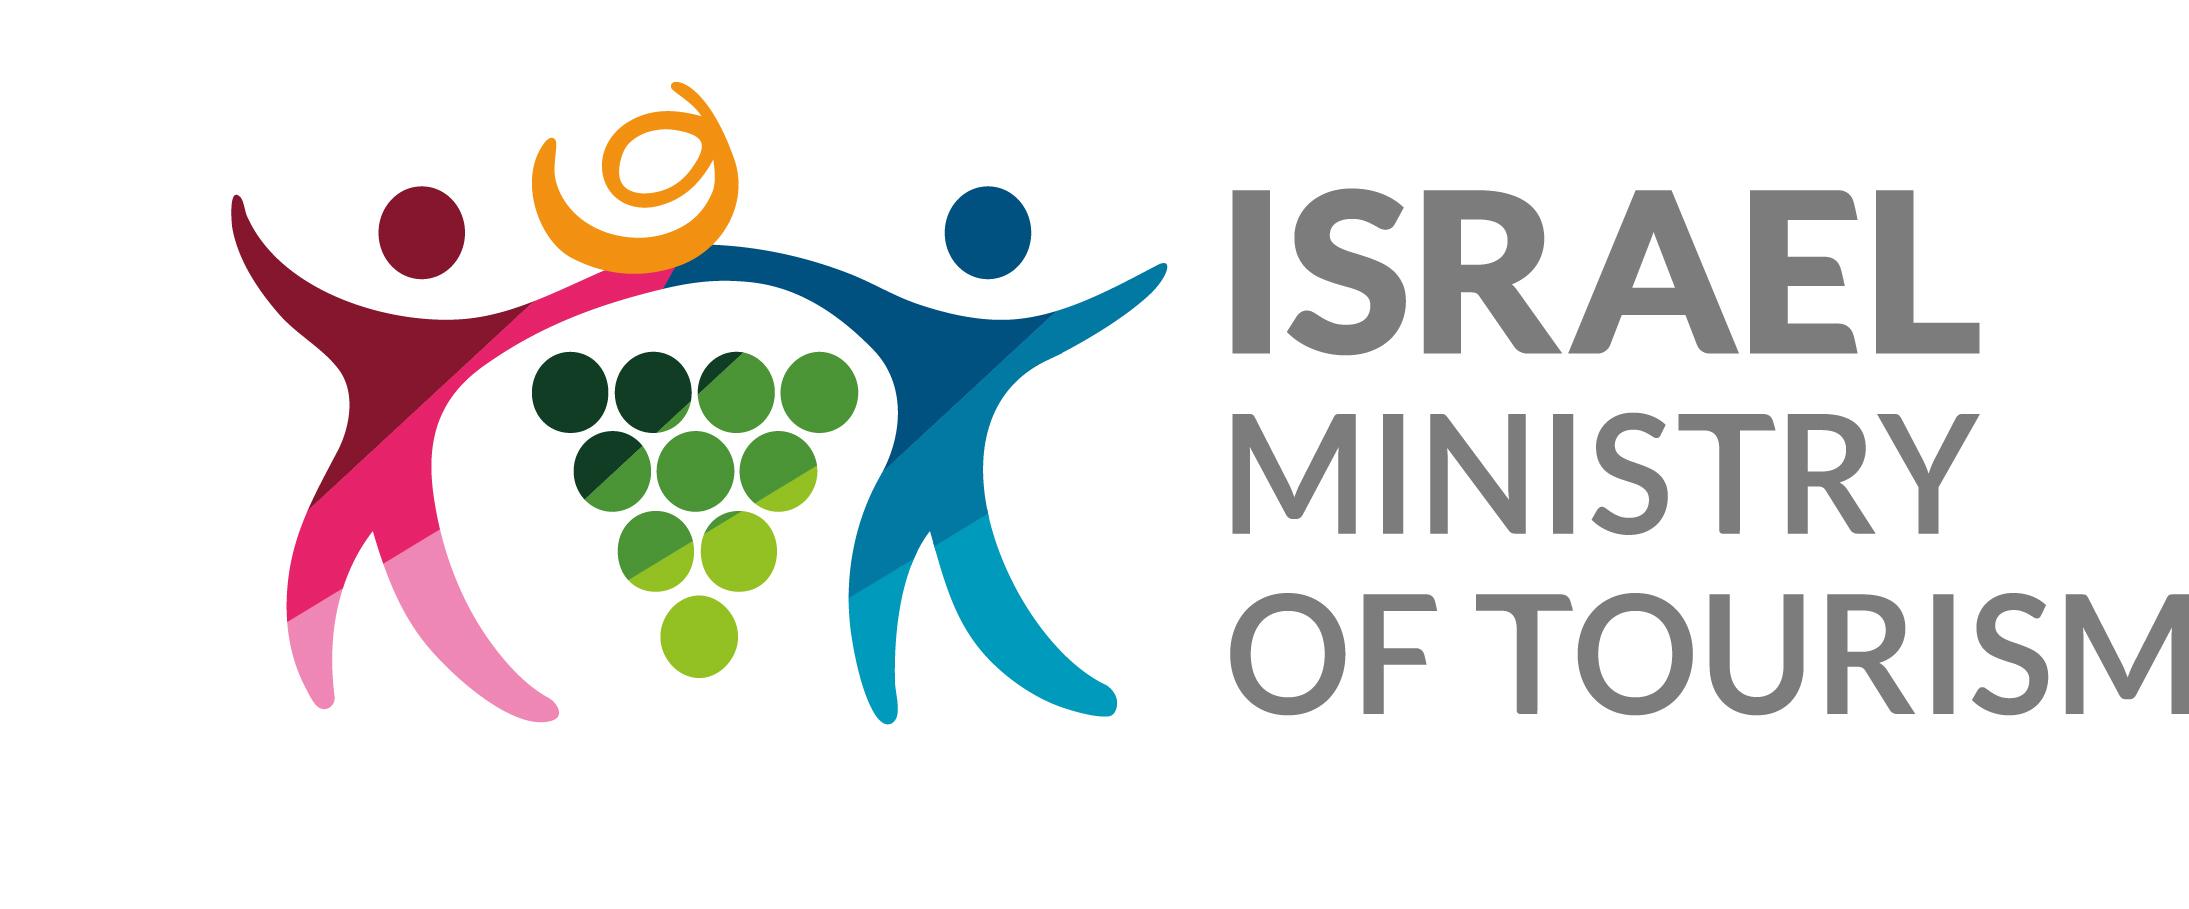 Resultado de imagen para Israel tourism logo png